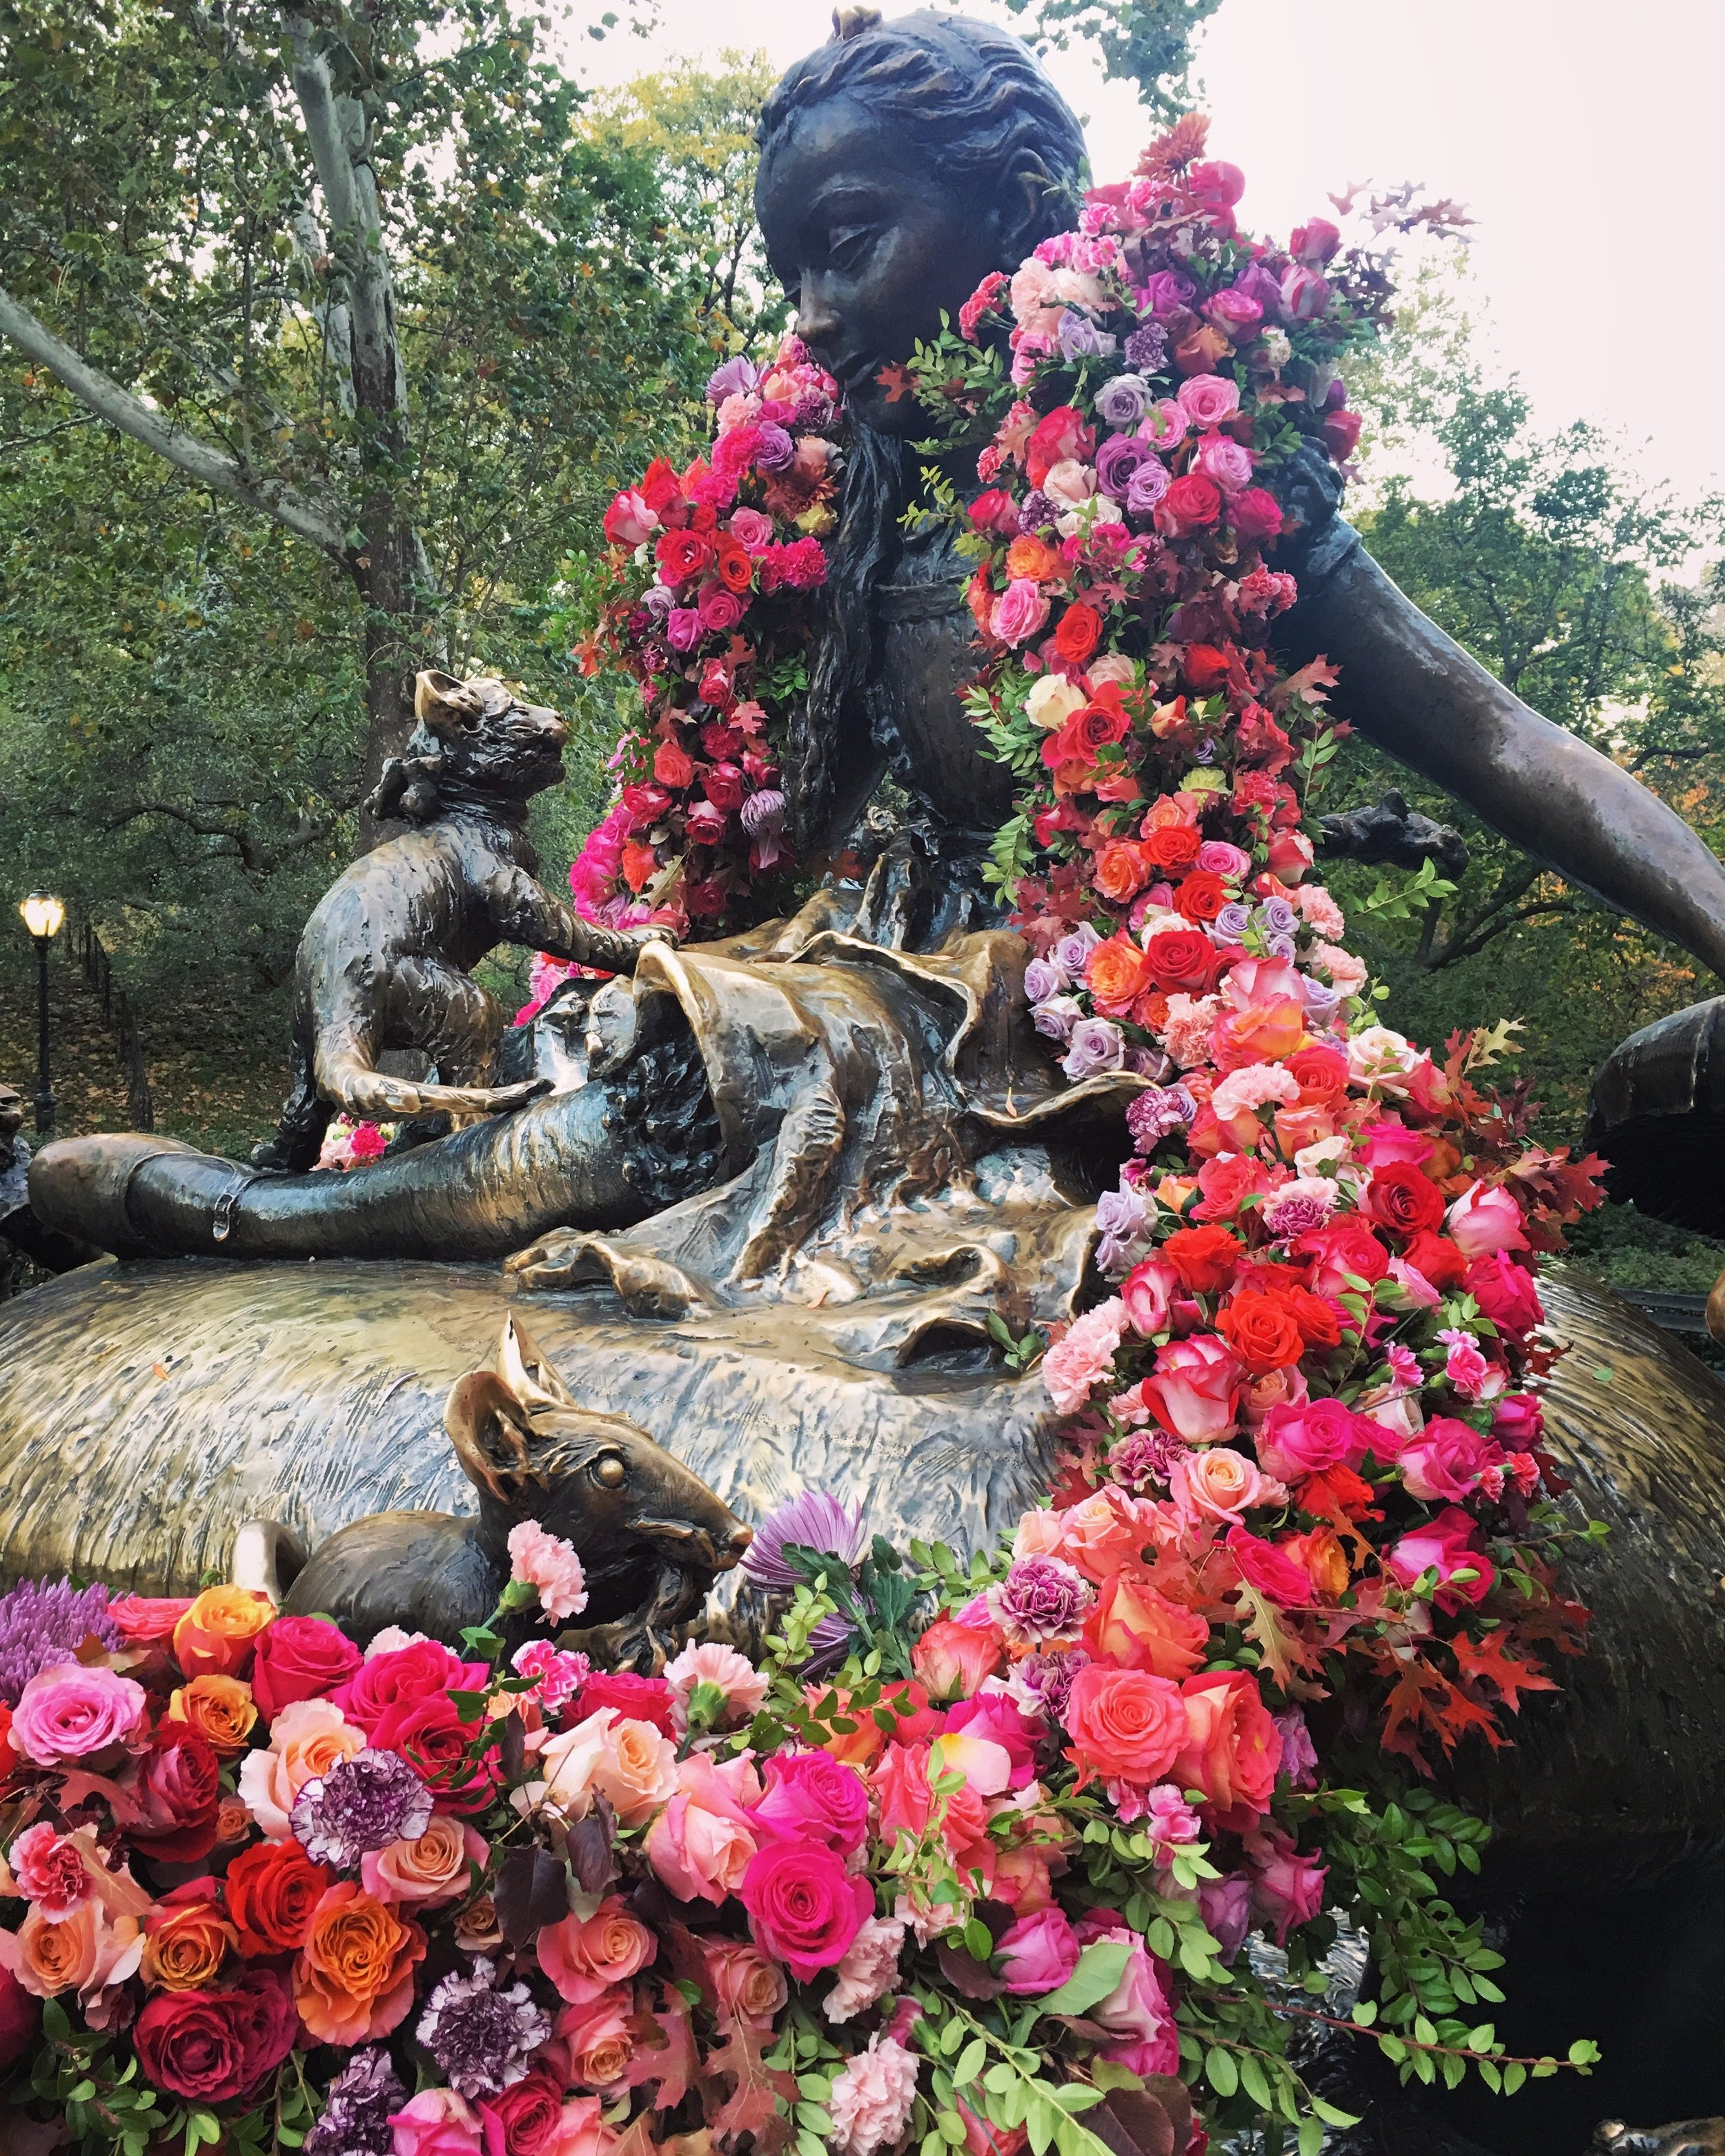 A garland of roses decks the beloved Alice in Wonderland statue in Central Park.